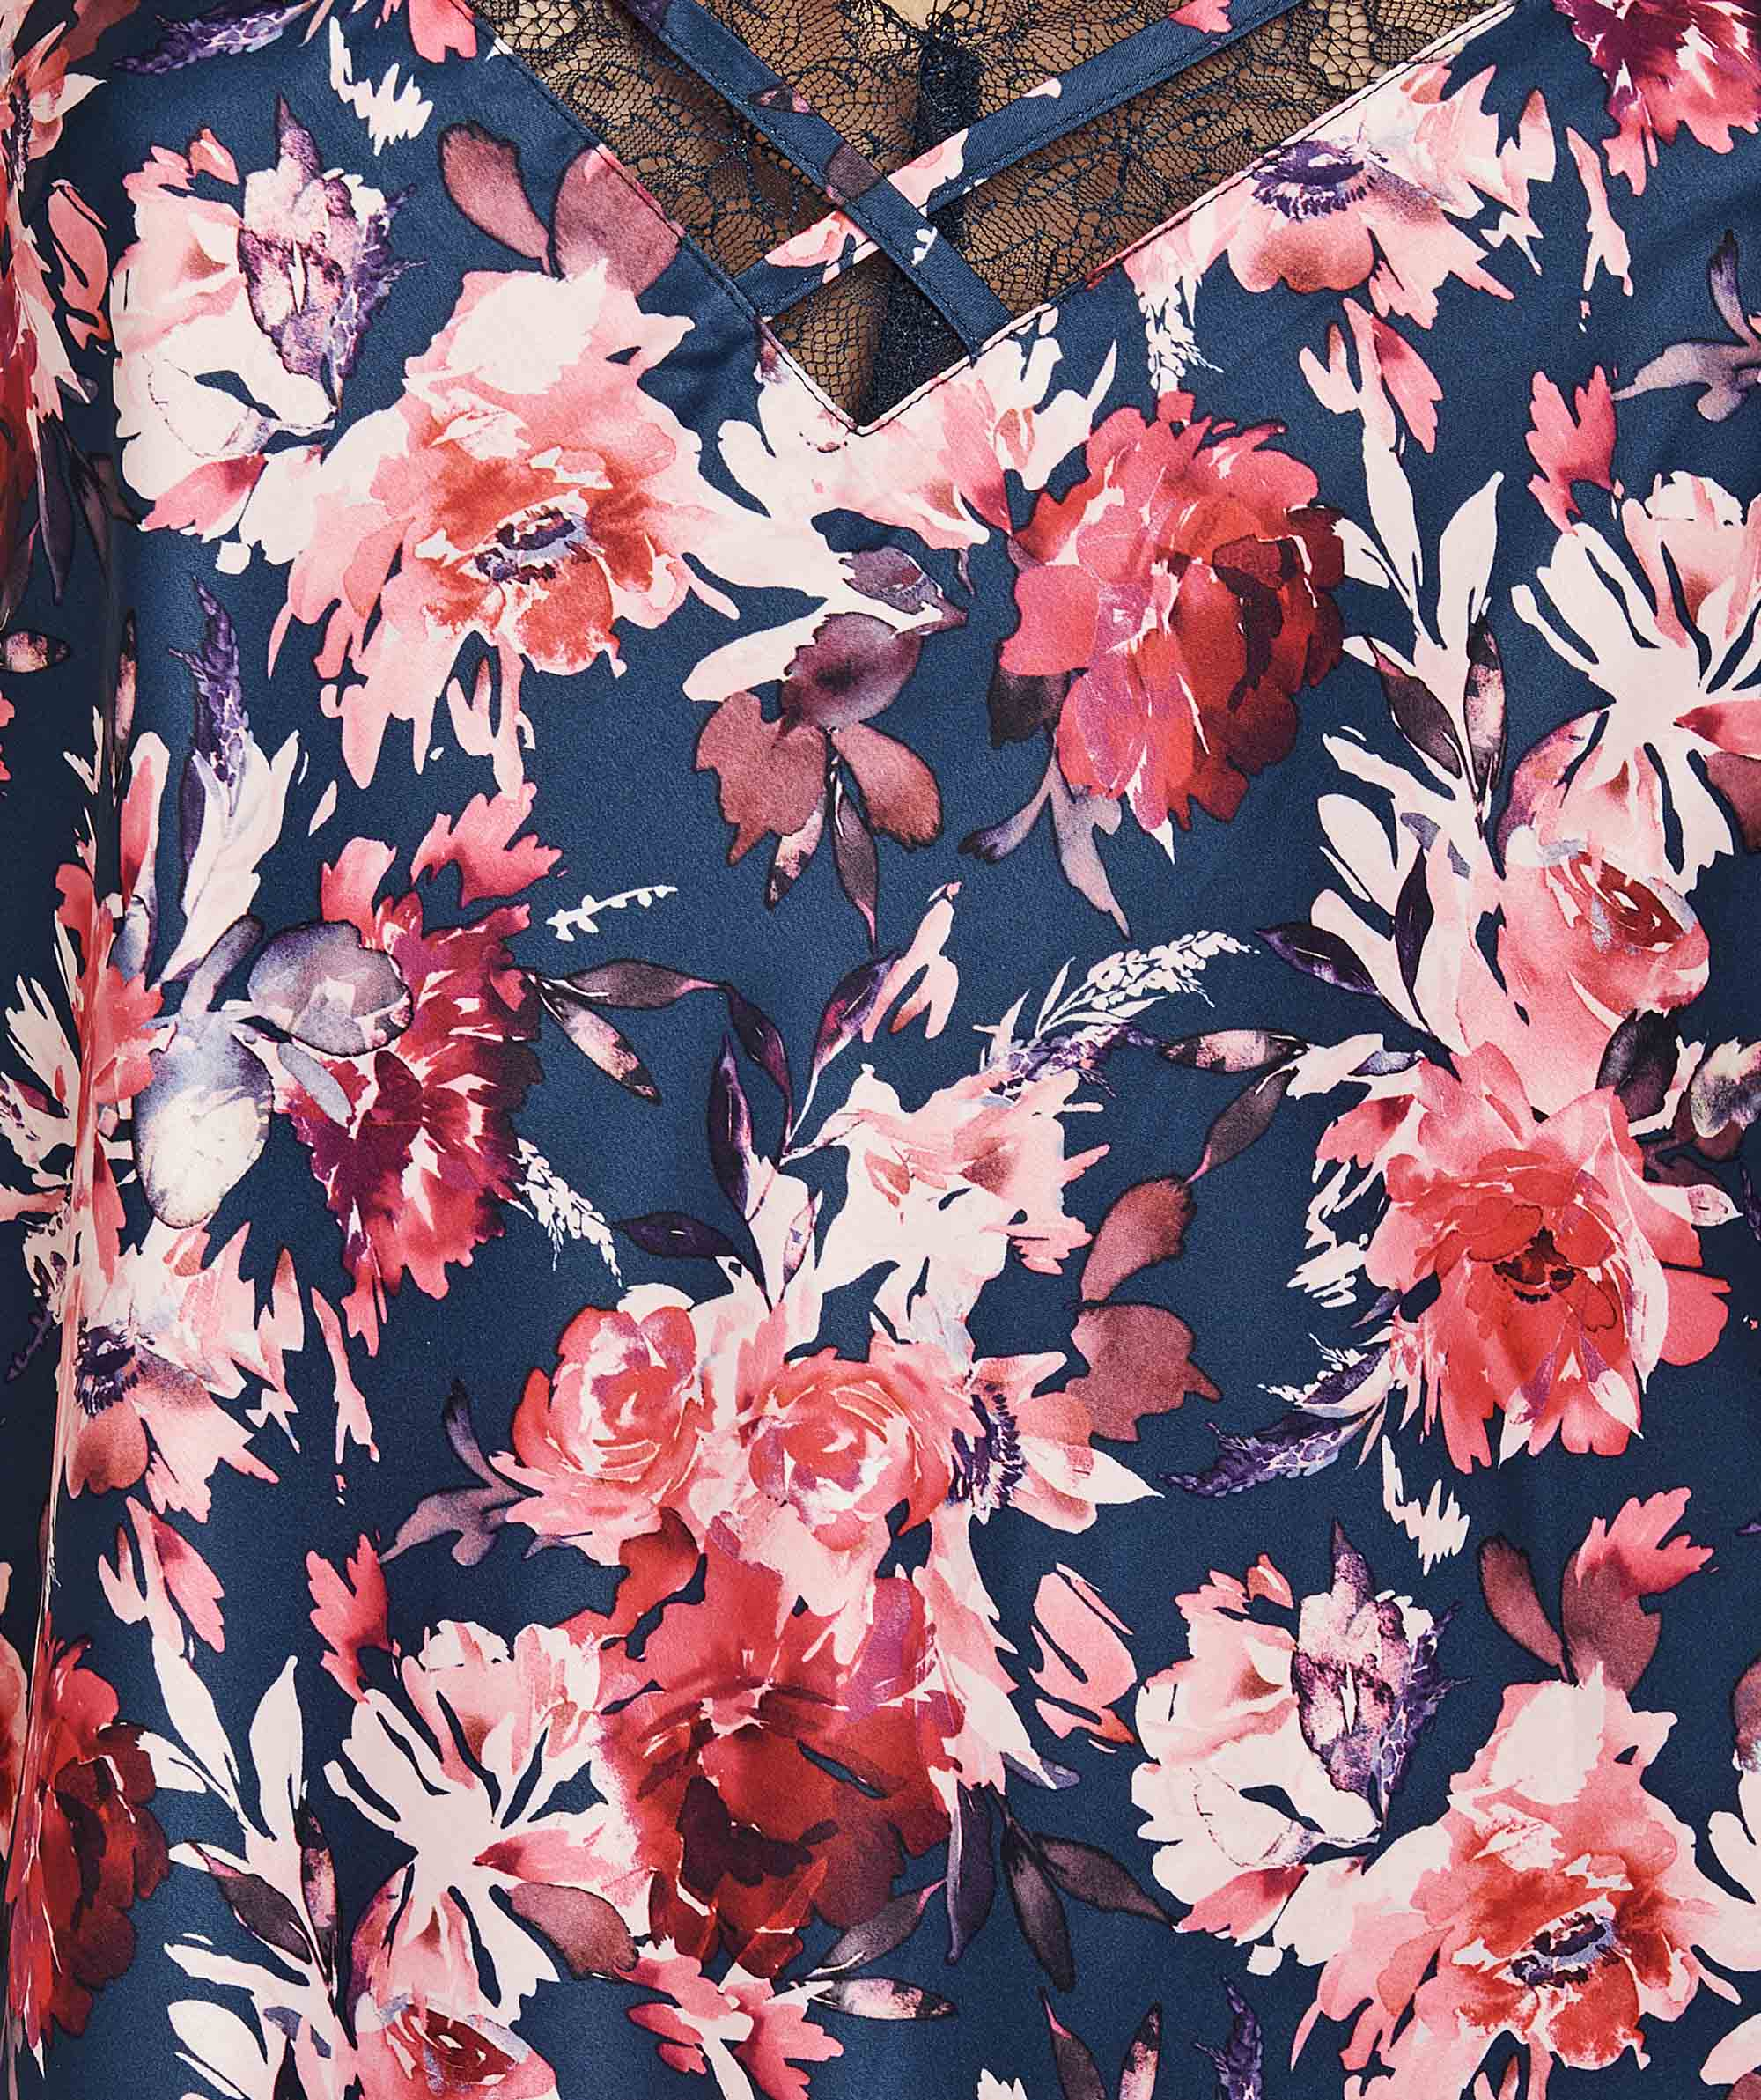 Evening Bloom Print Cami - Floral Print